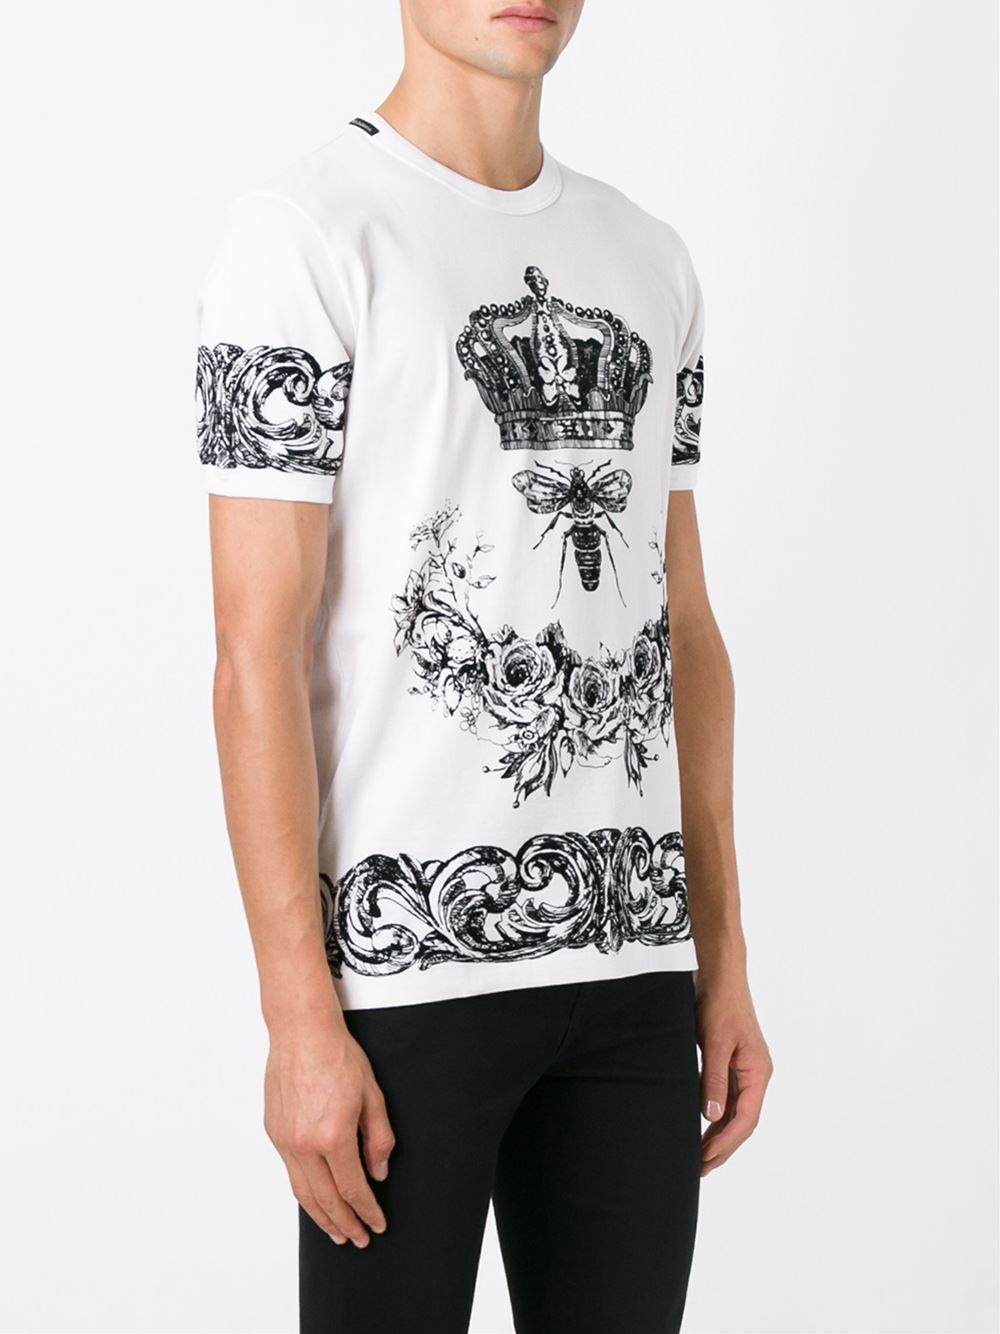 T shirt design hip hop - Boys T Shirt With Print Or Embroidery Design Hip Hop T Shirt